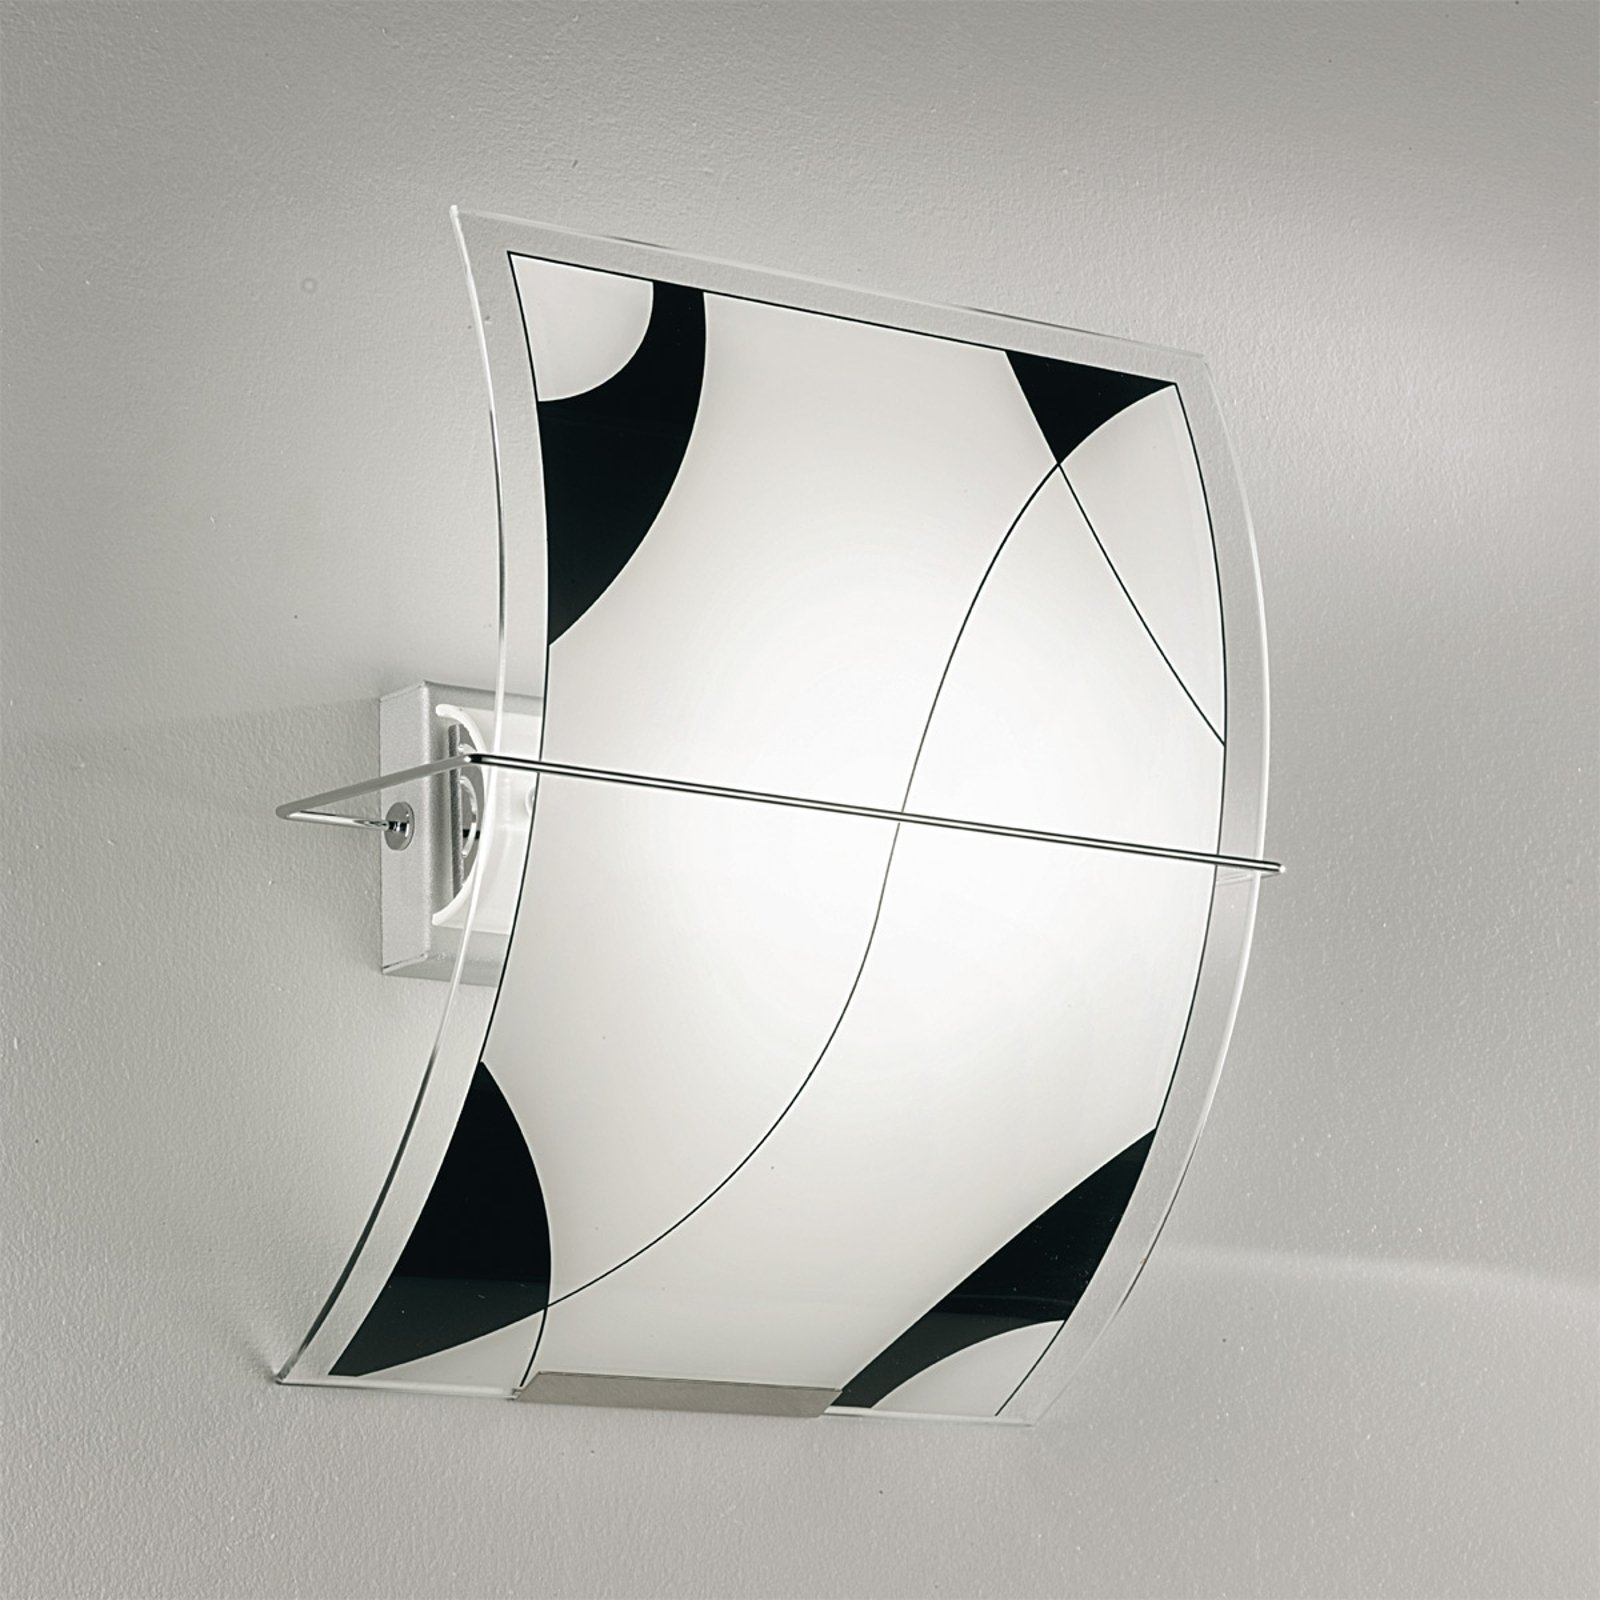 Eksklusiv vegglampe Smart, 25 cm